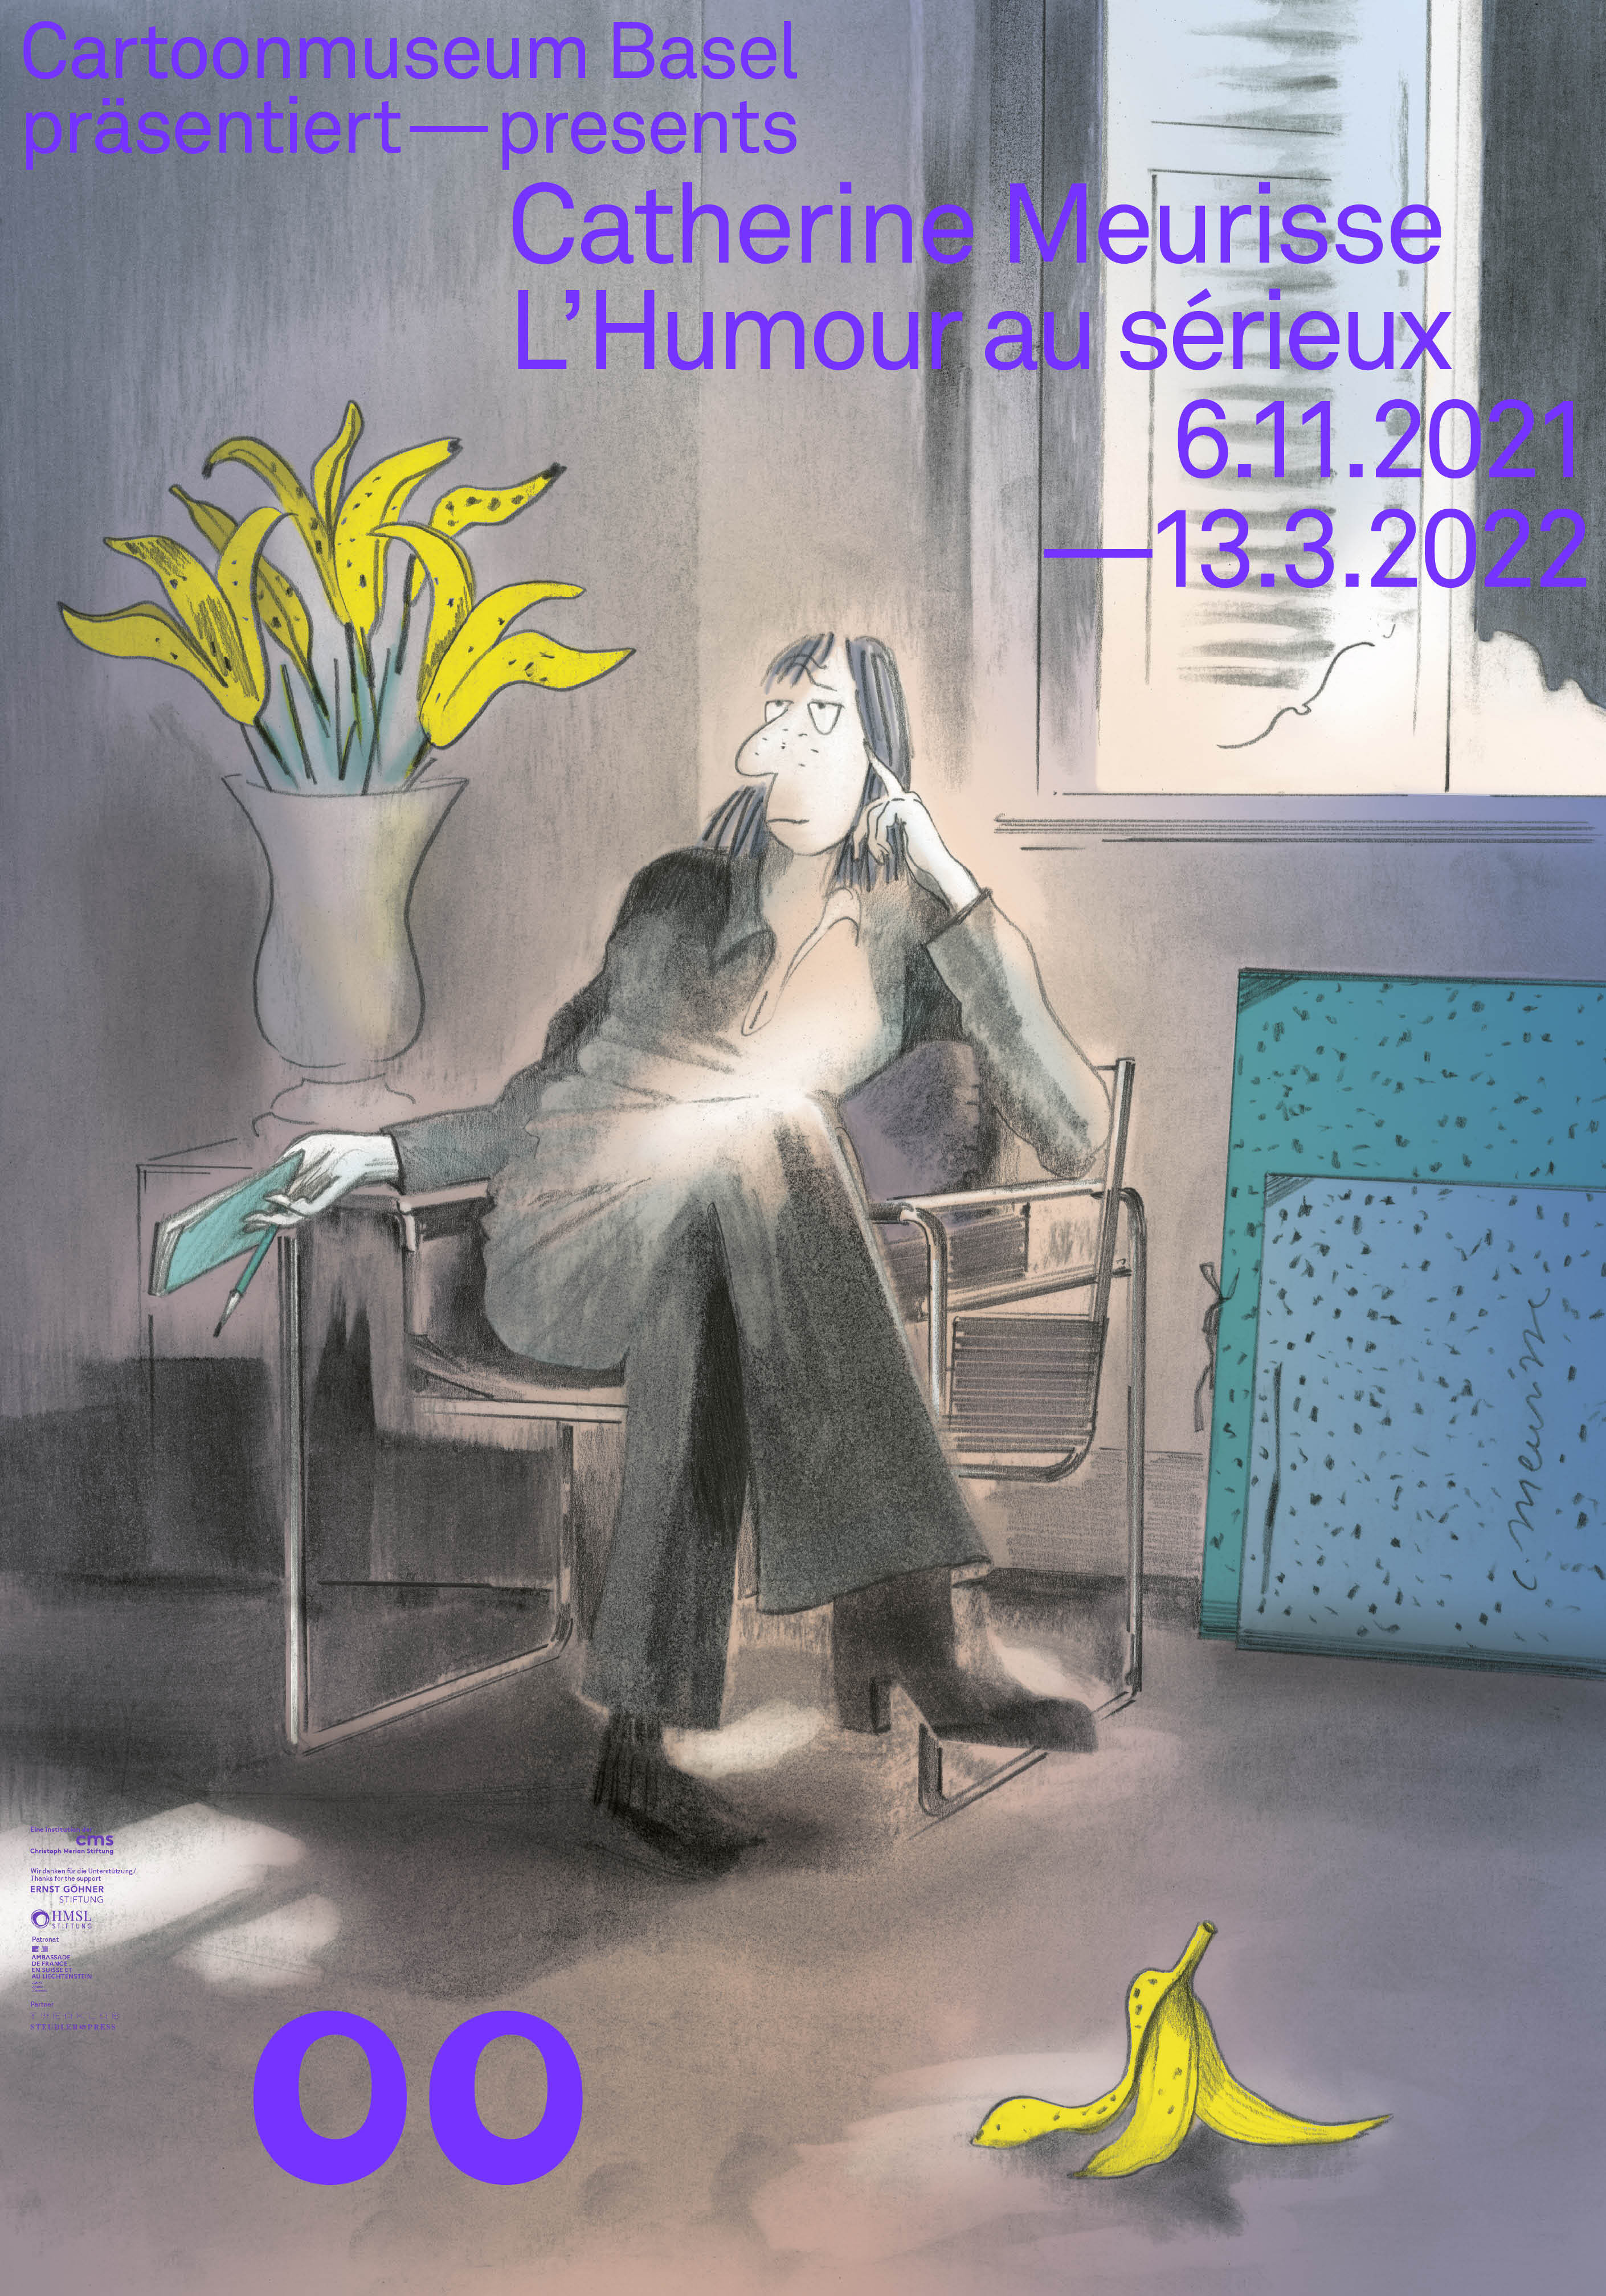 210930 Cartoon Catherine Meurisse Plakat F4 RZ low